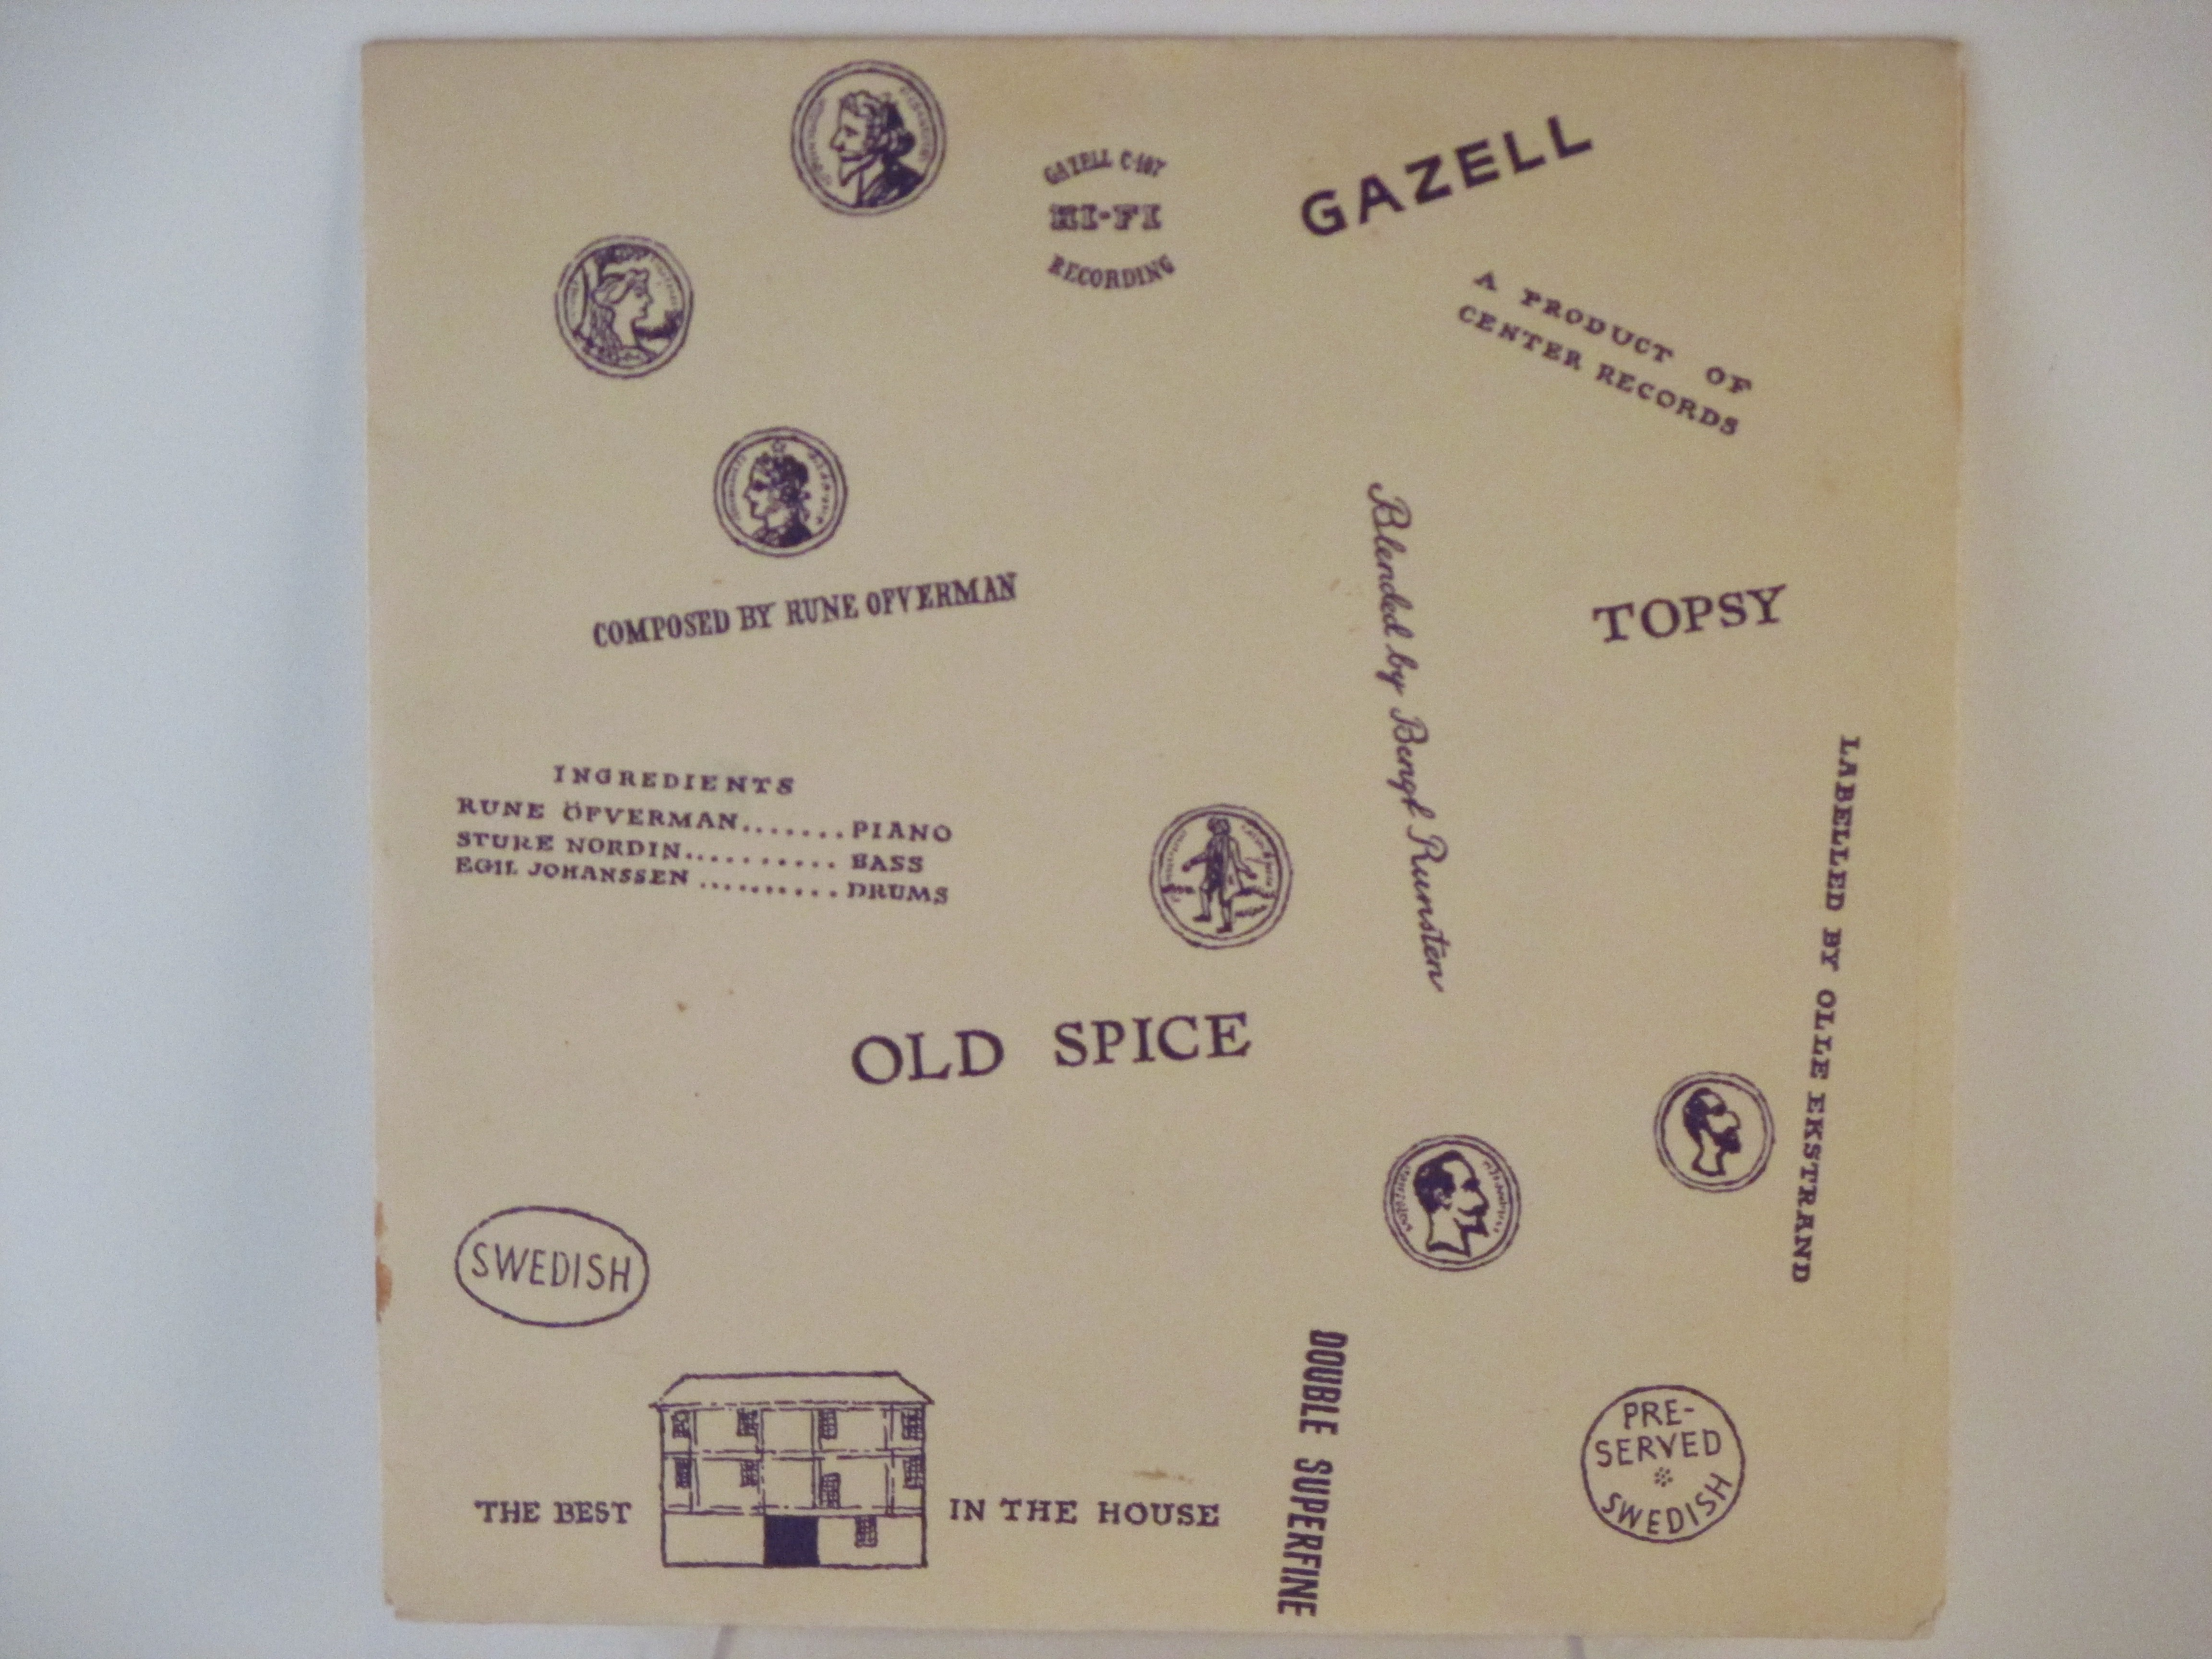 RUNE ÖFWERMAN TRIO : Topsy / Old spice